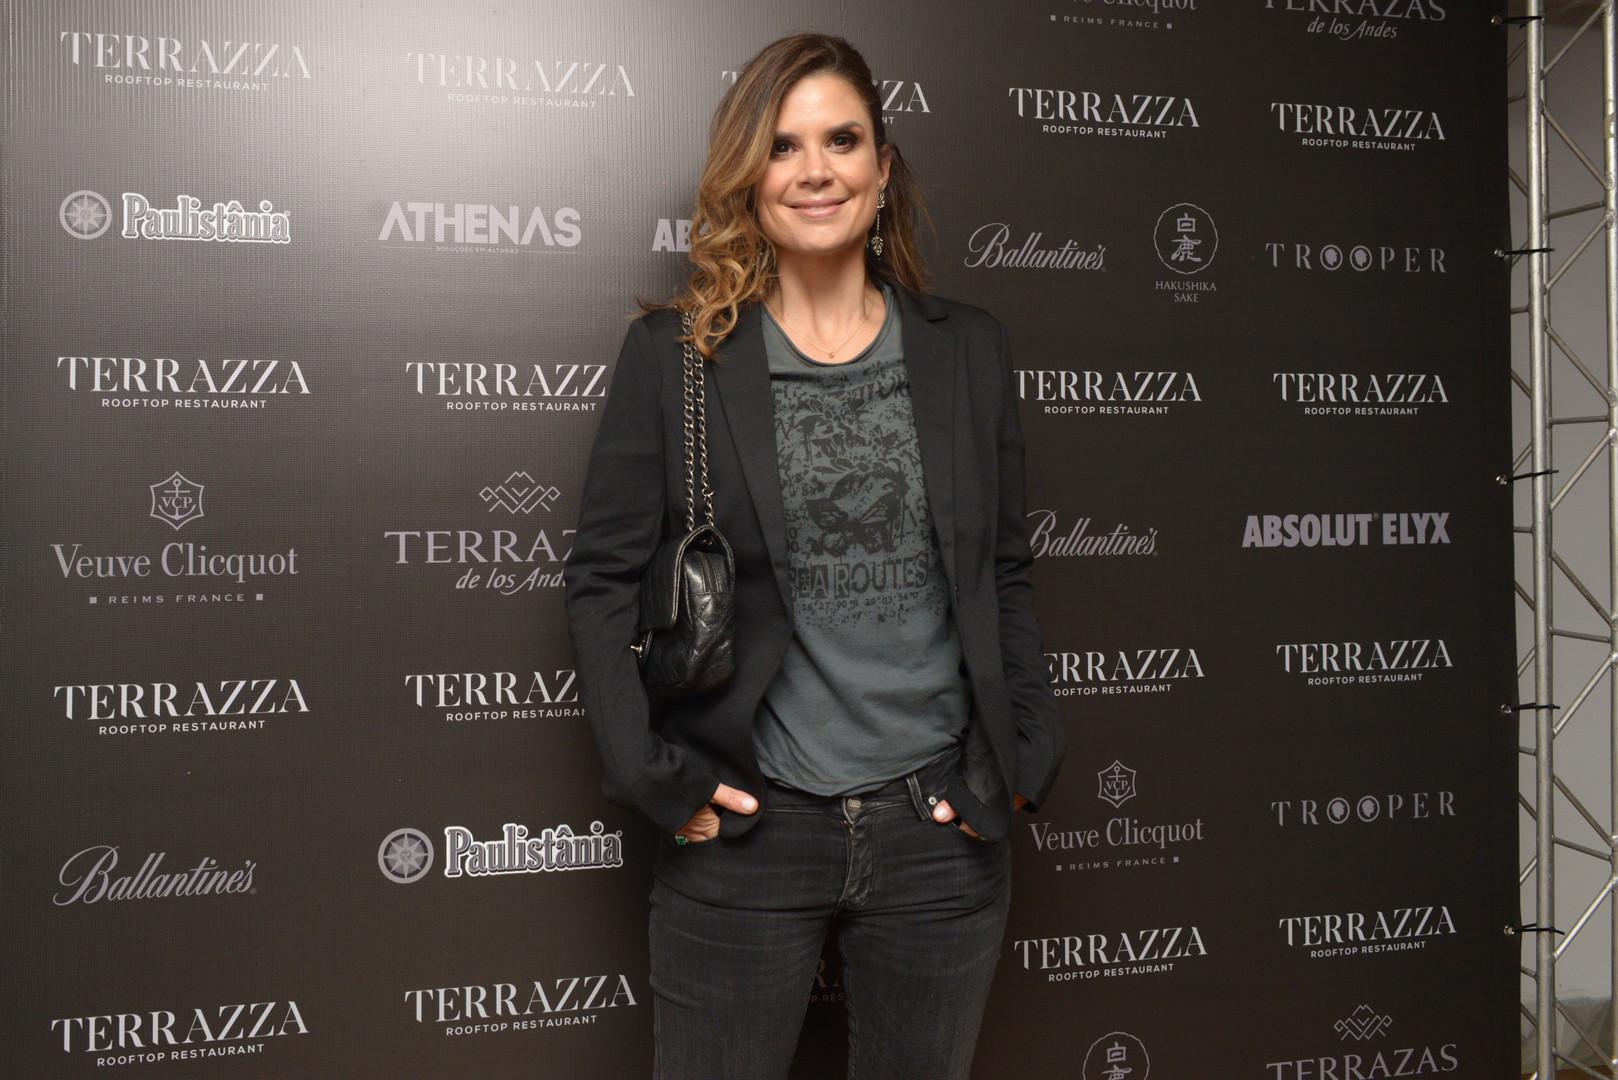 Inauguração_Terrazza_Mariana_Kupfer_-335